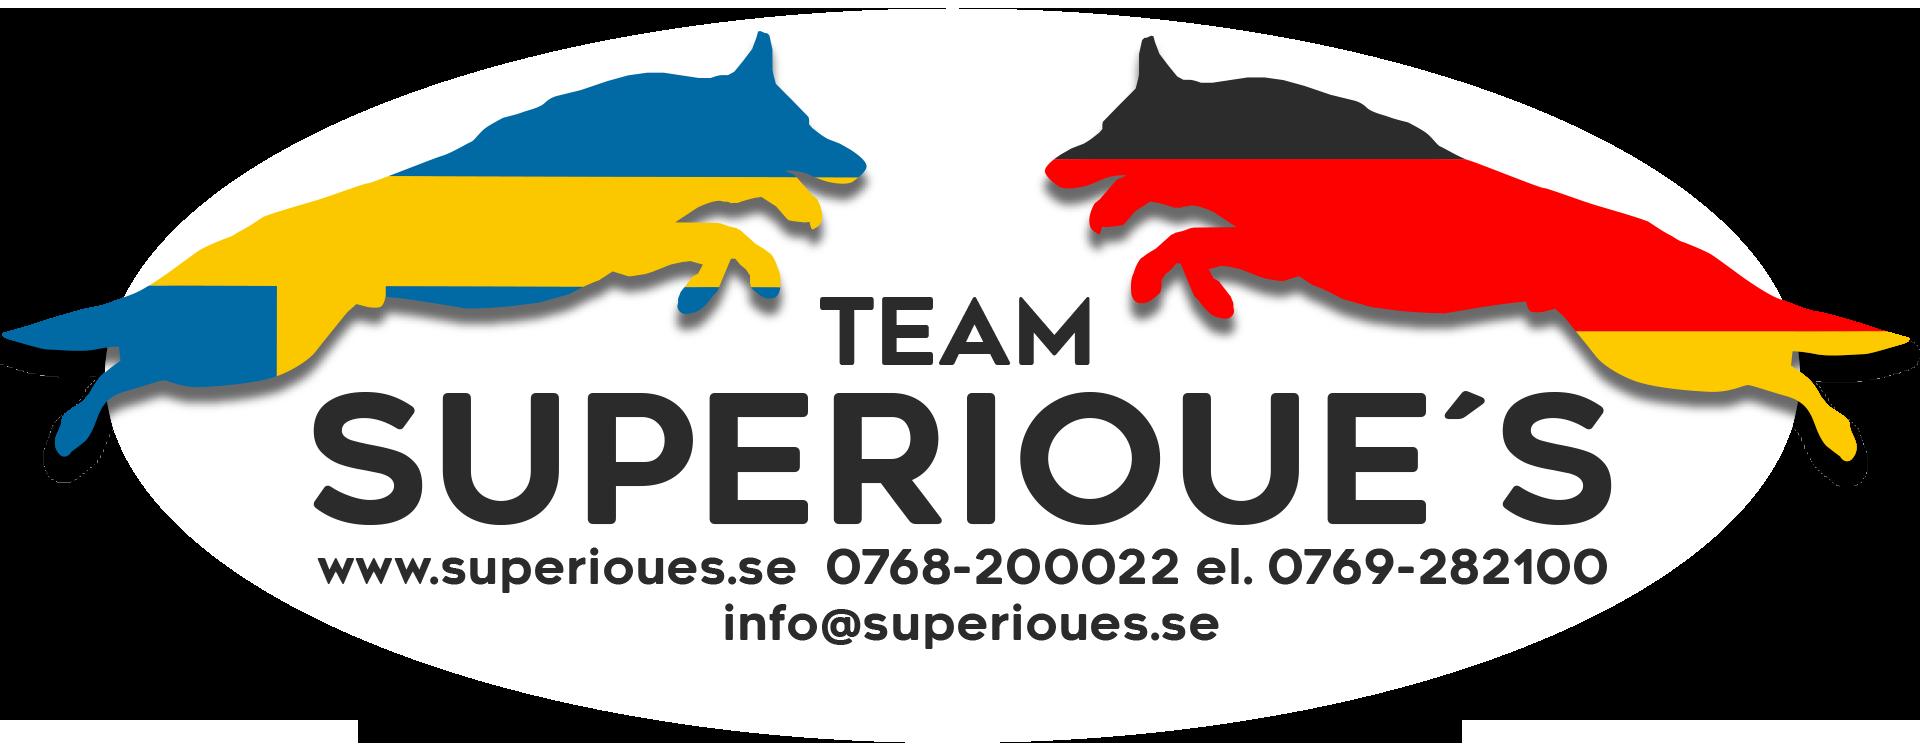 team superioues